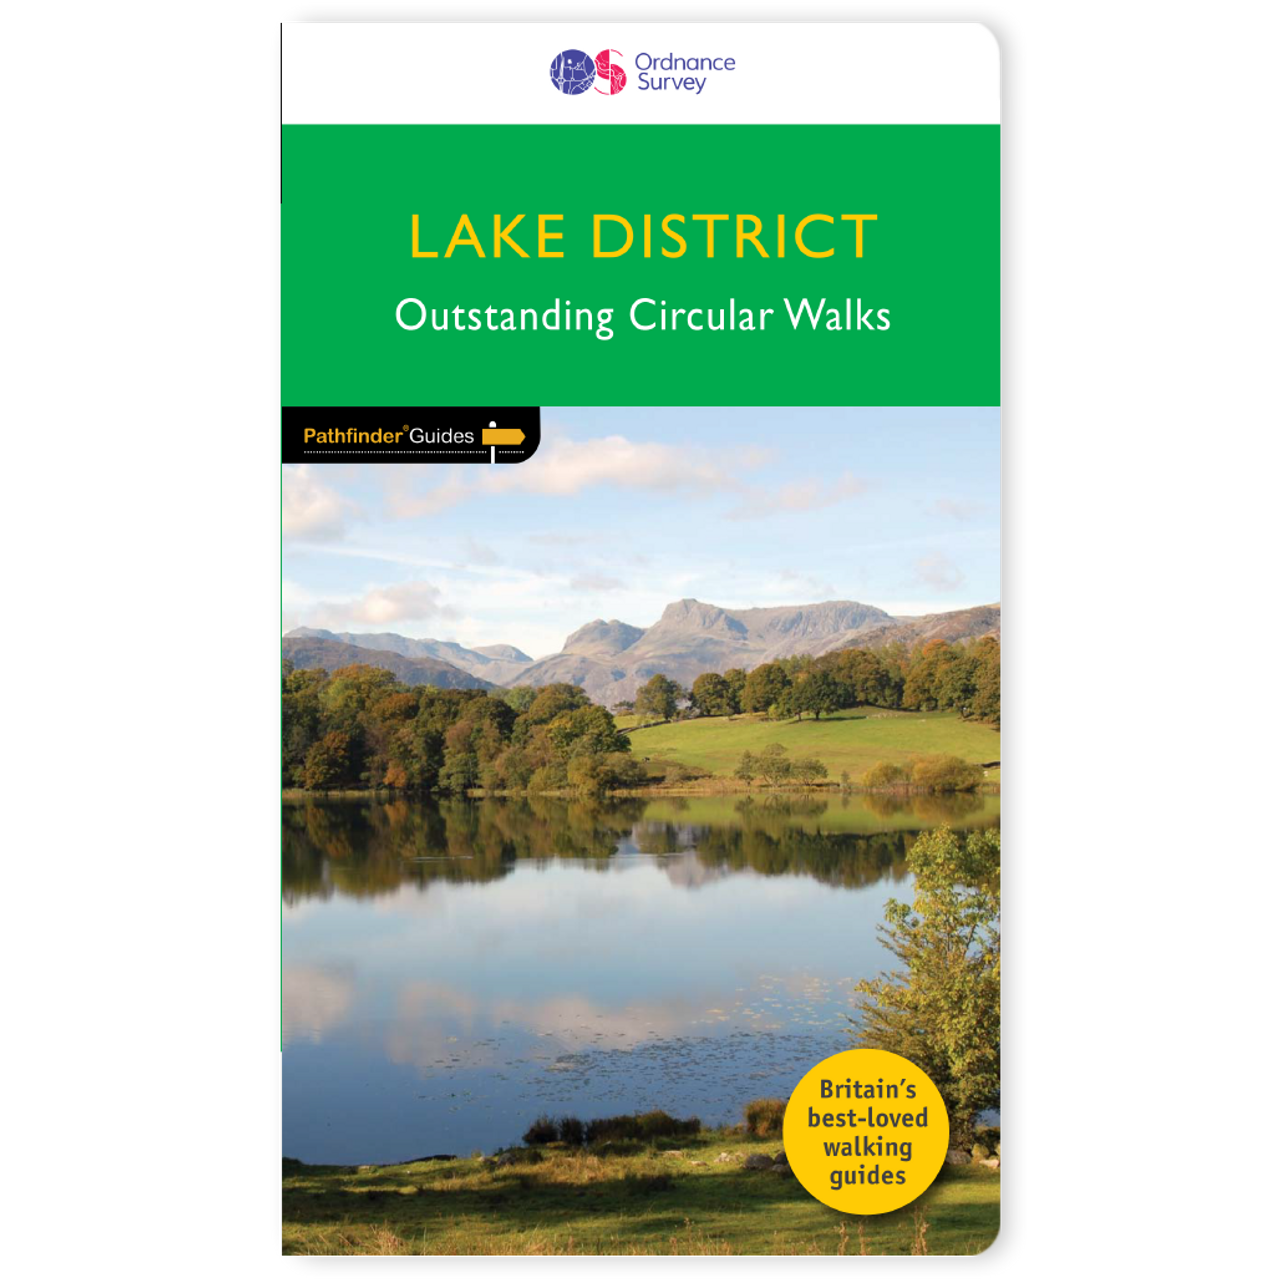 Lake District - Pathfinder Walks Guidebook